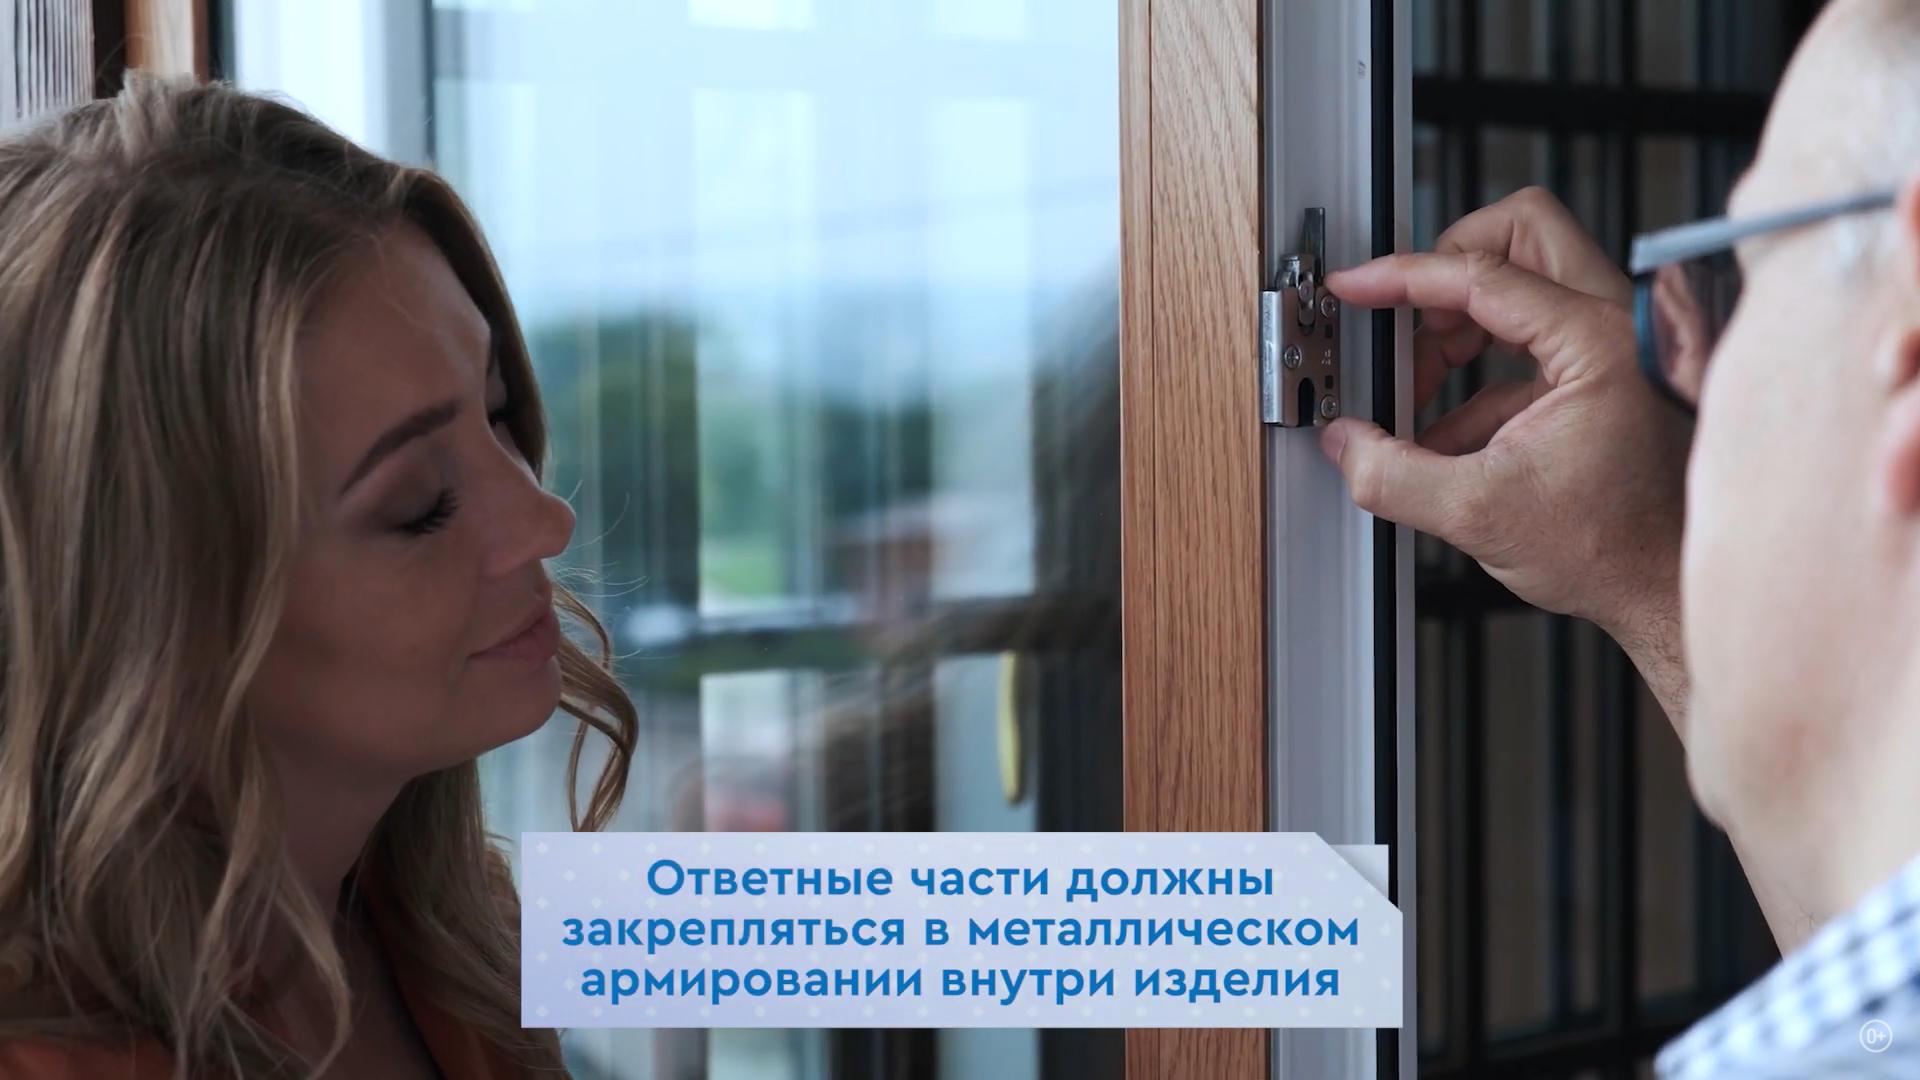 Противовзломные окна VEKA - Как устроено противовзломное окно